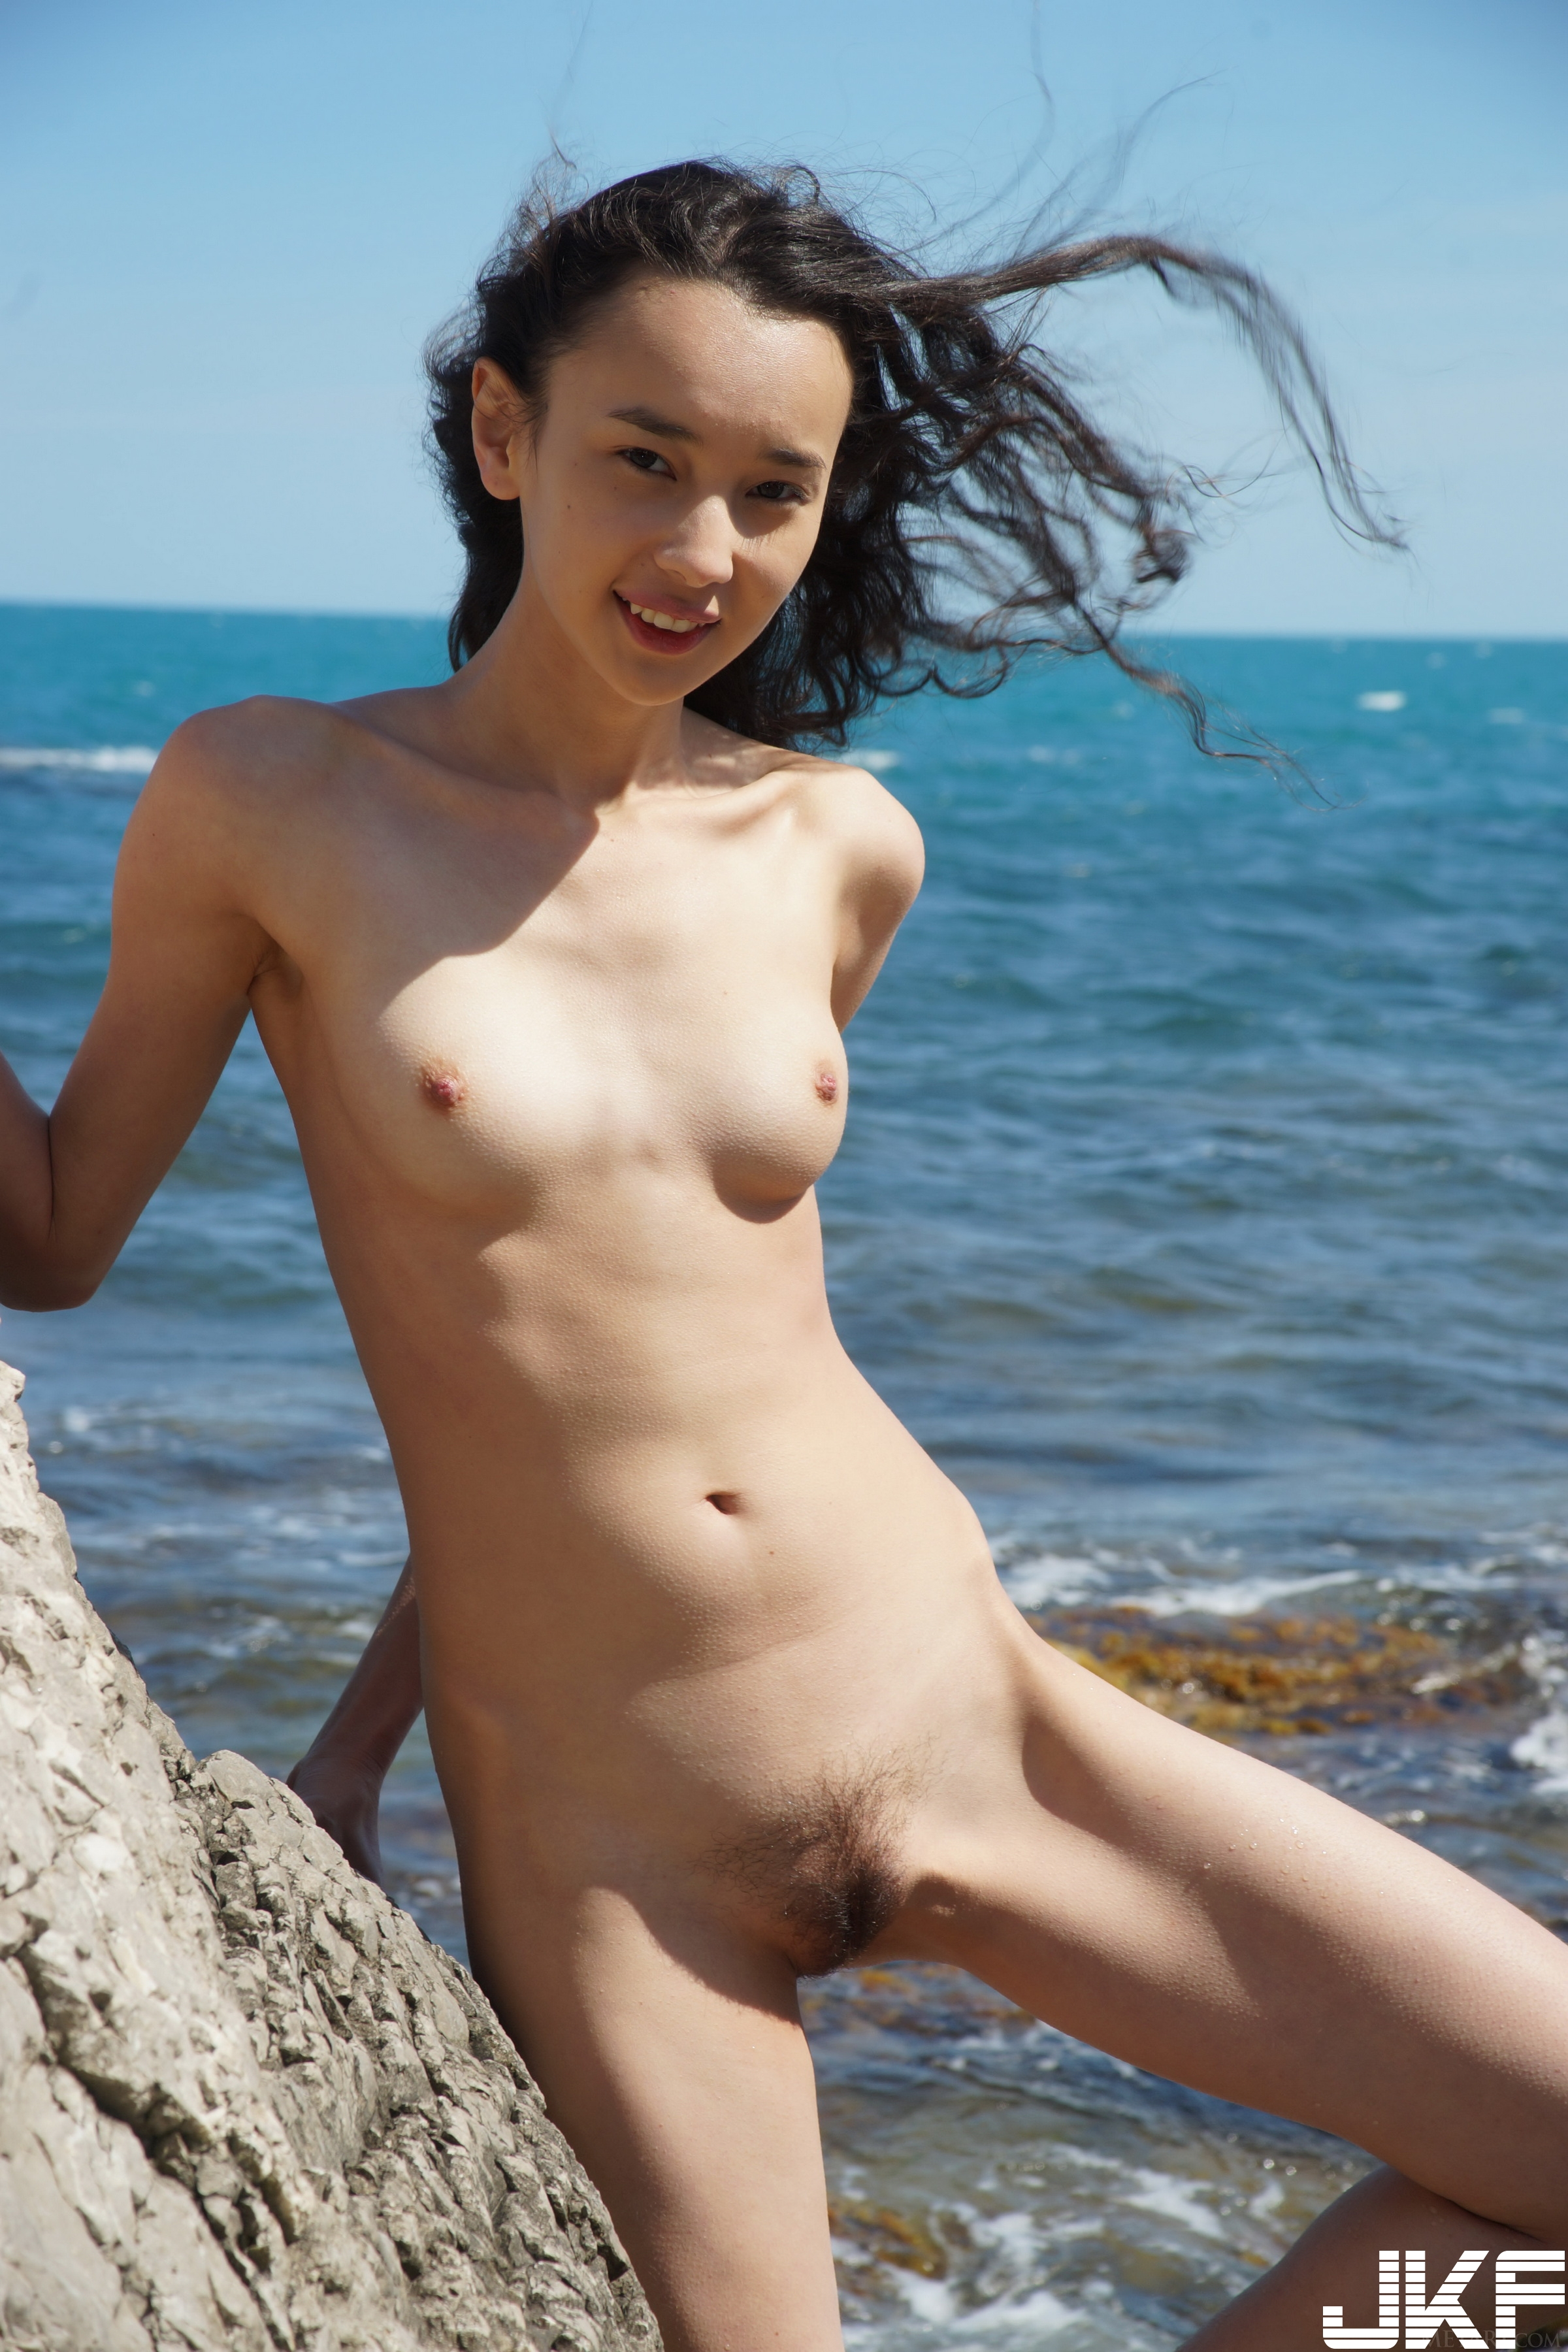 MetArt_Open-Seas_Djessy_high_0083.jpg